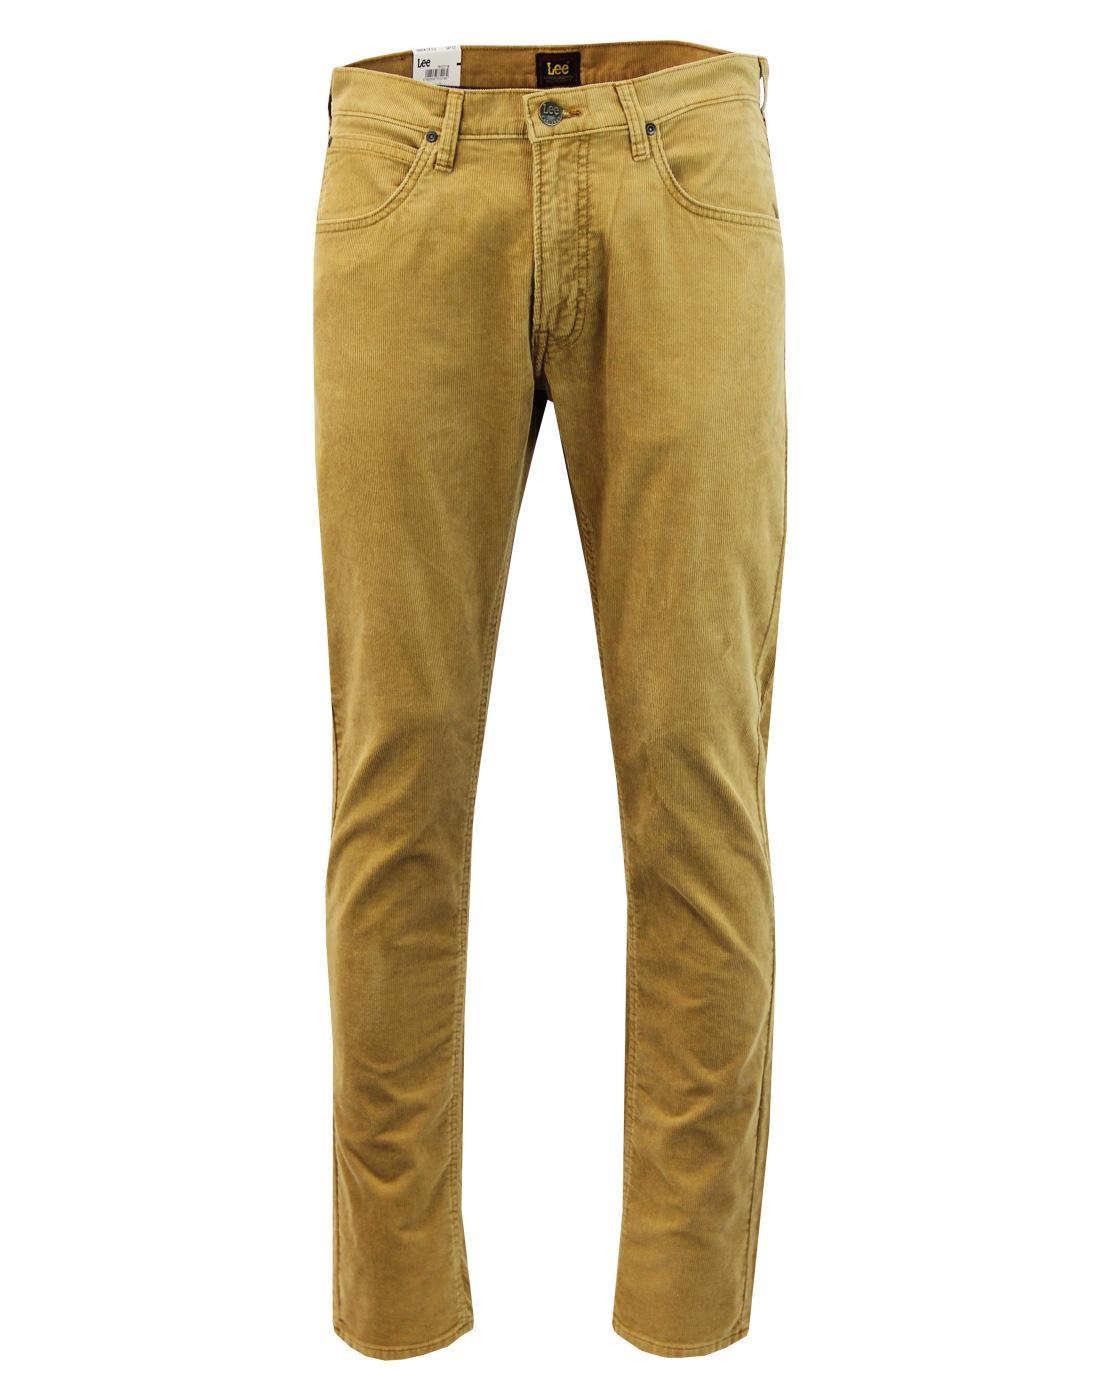 Daren LEE Men's Retro Mod Slim Cord Trousers DIJON